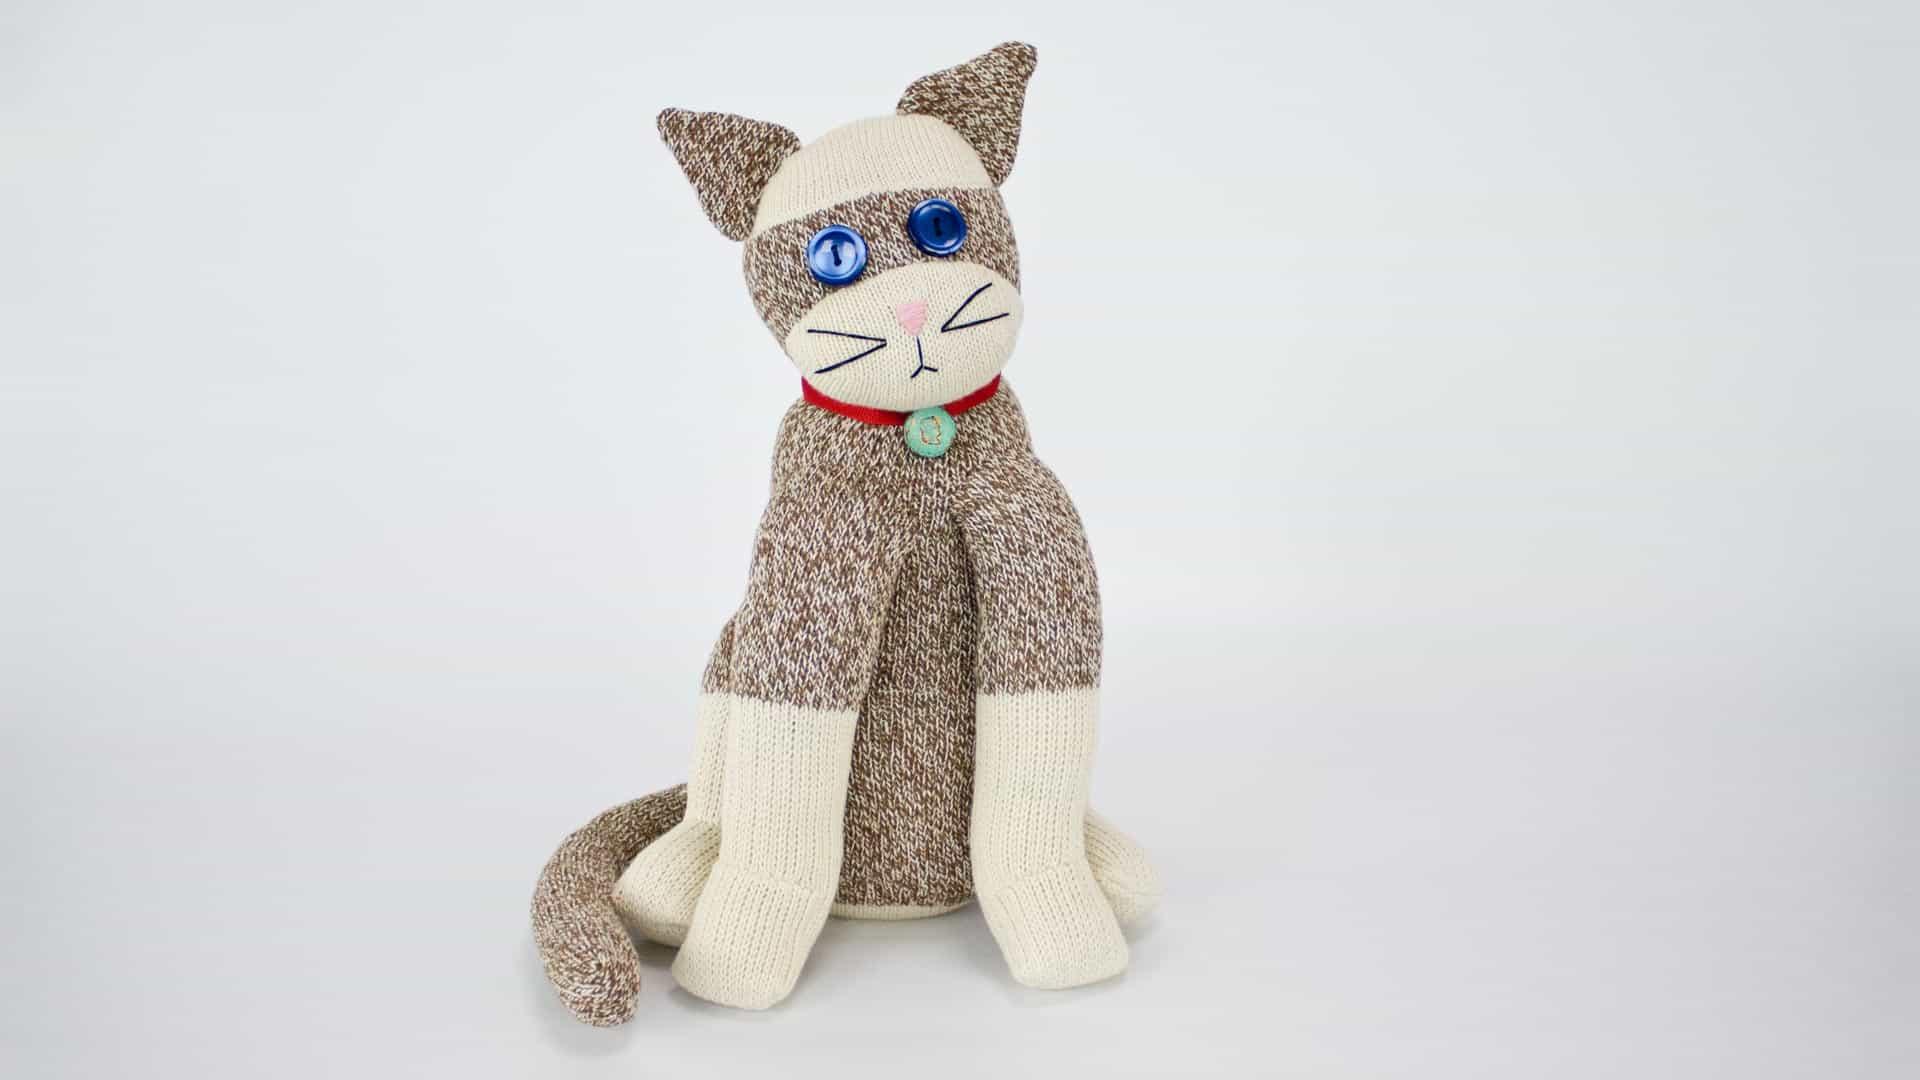 Sock monkey style plush cat